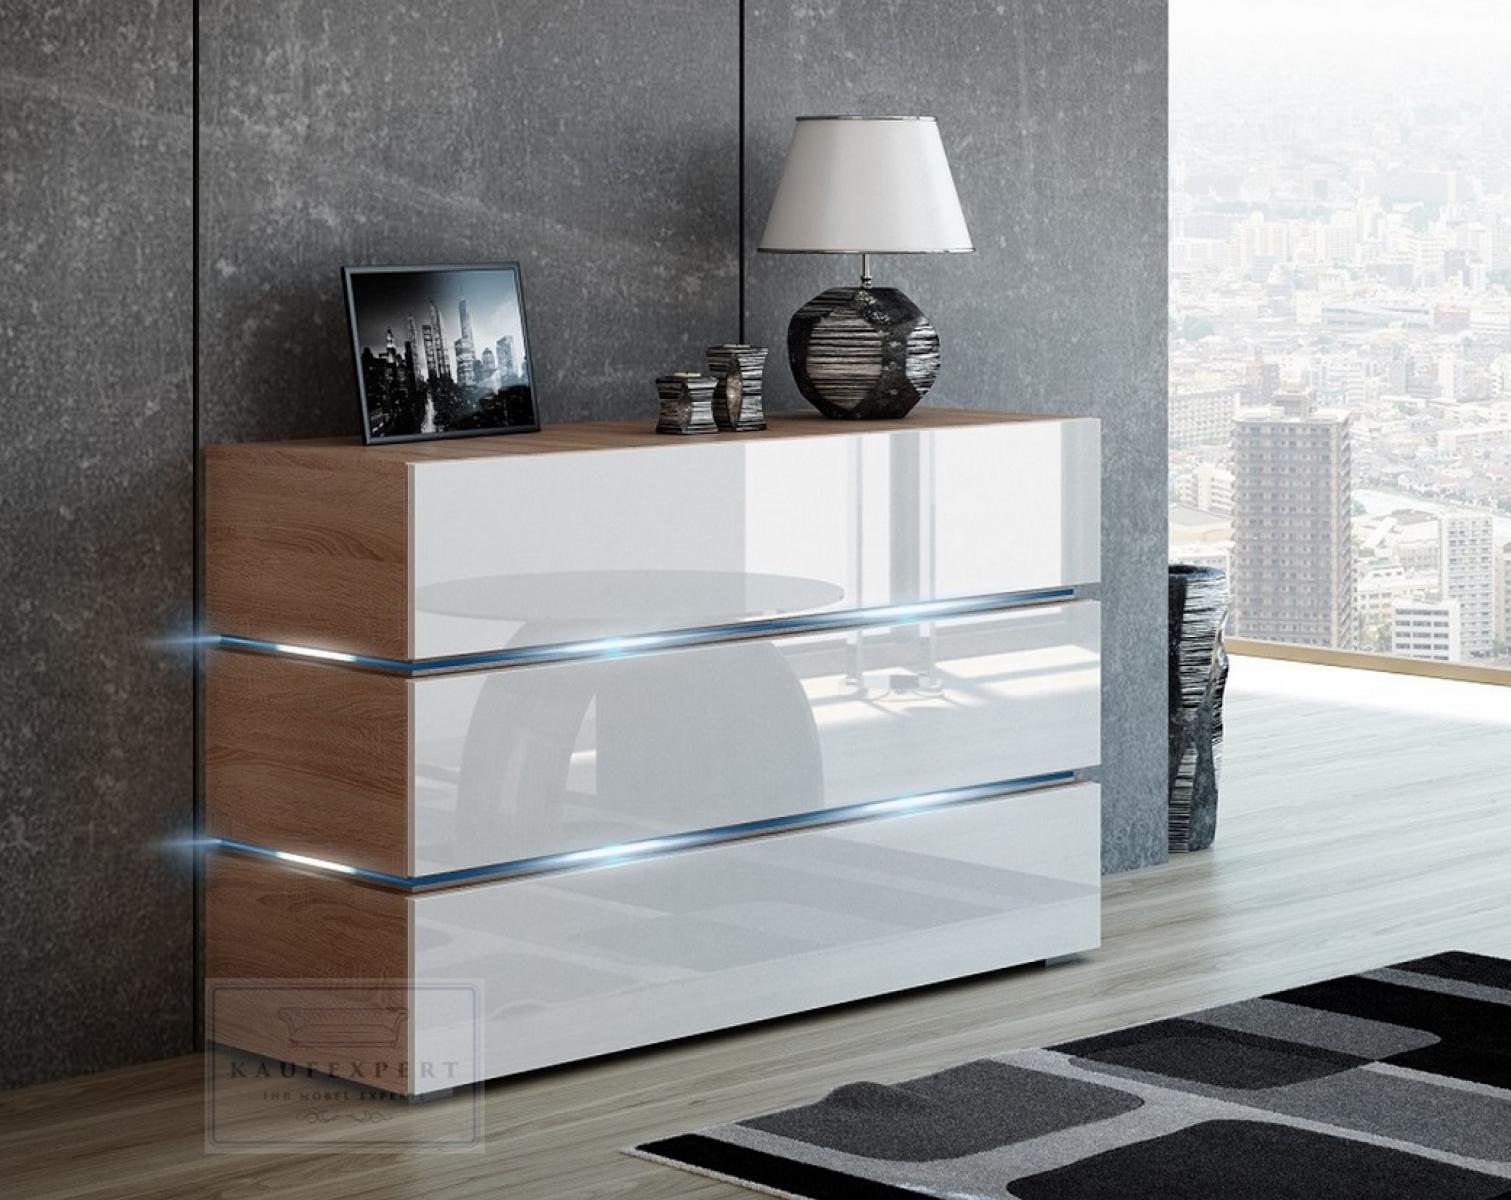 Kaufexpert Kommode Shine Sideboard 120 Cm Weiss Hochglanz Sonoma